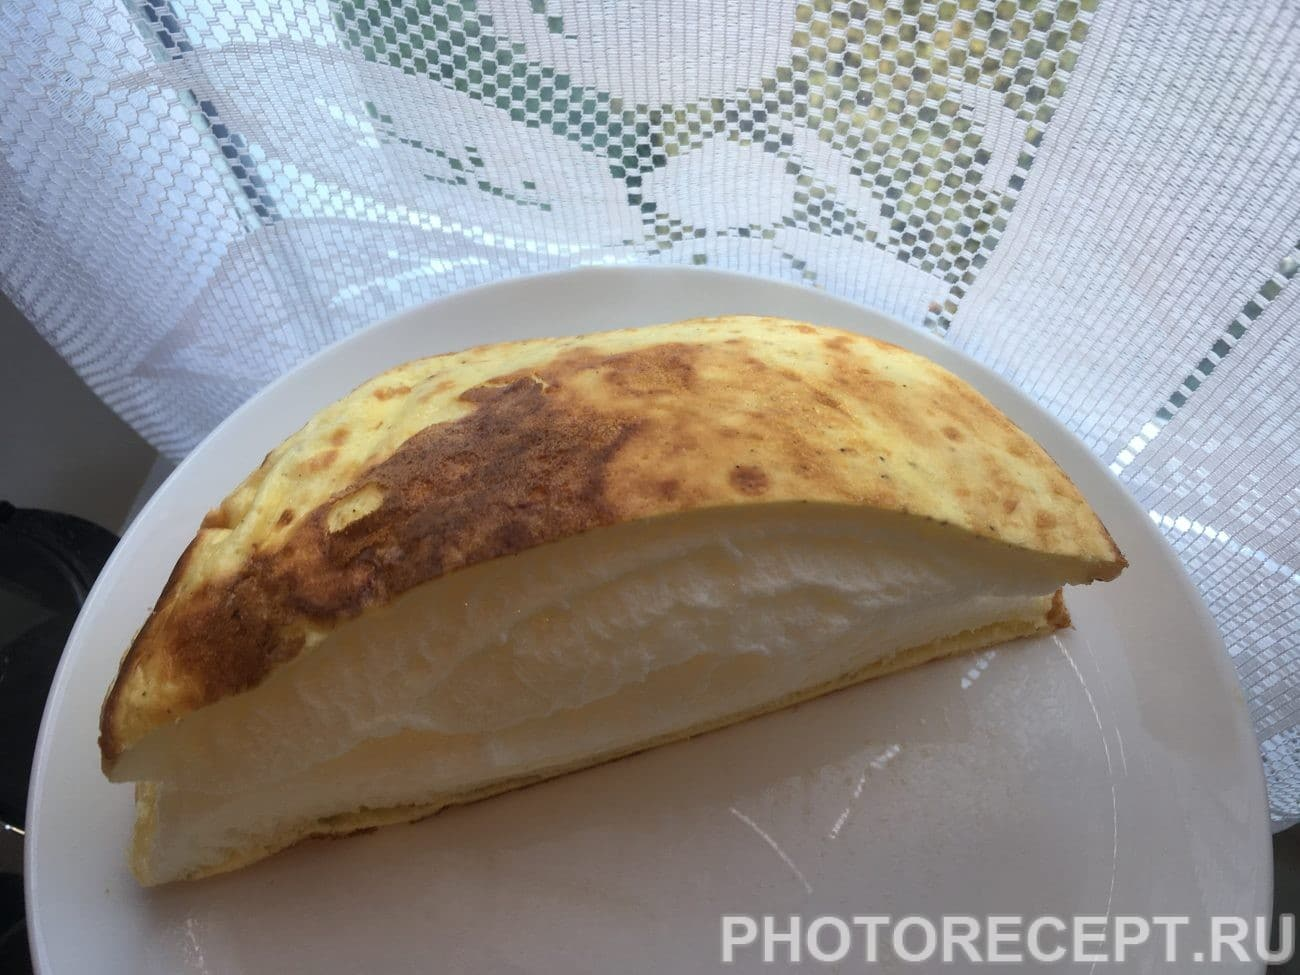 Омлет матушки Пуляр на завтрак - рецепт пошаговый с фото